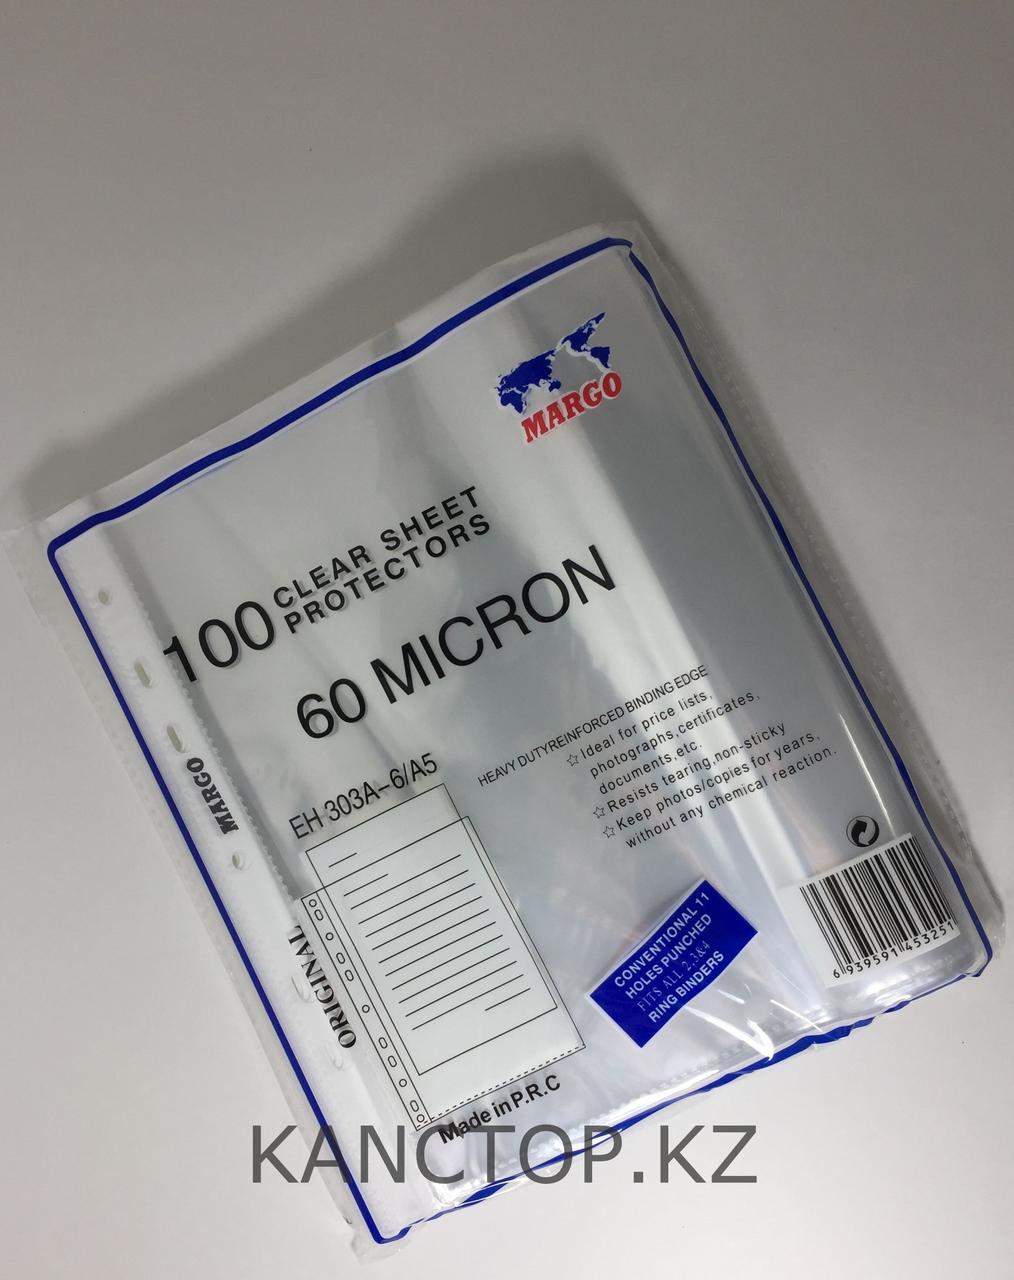 Файл - вкладыш А4 MARGO 60 мкр прозрачный